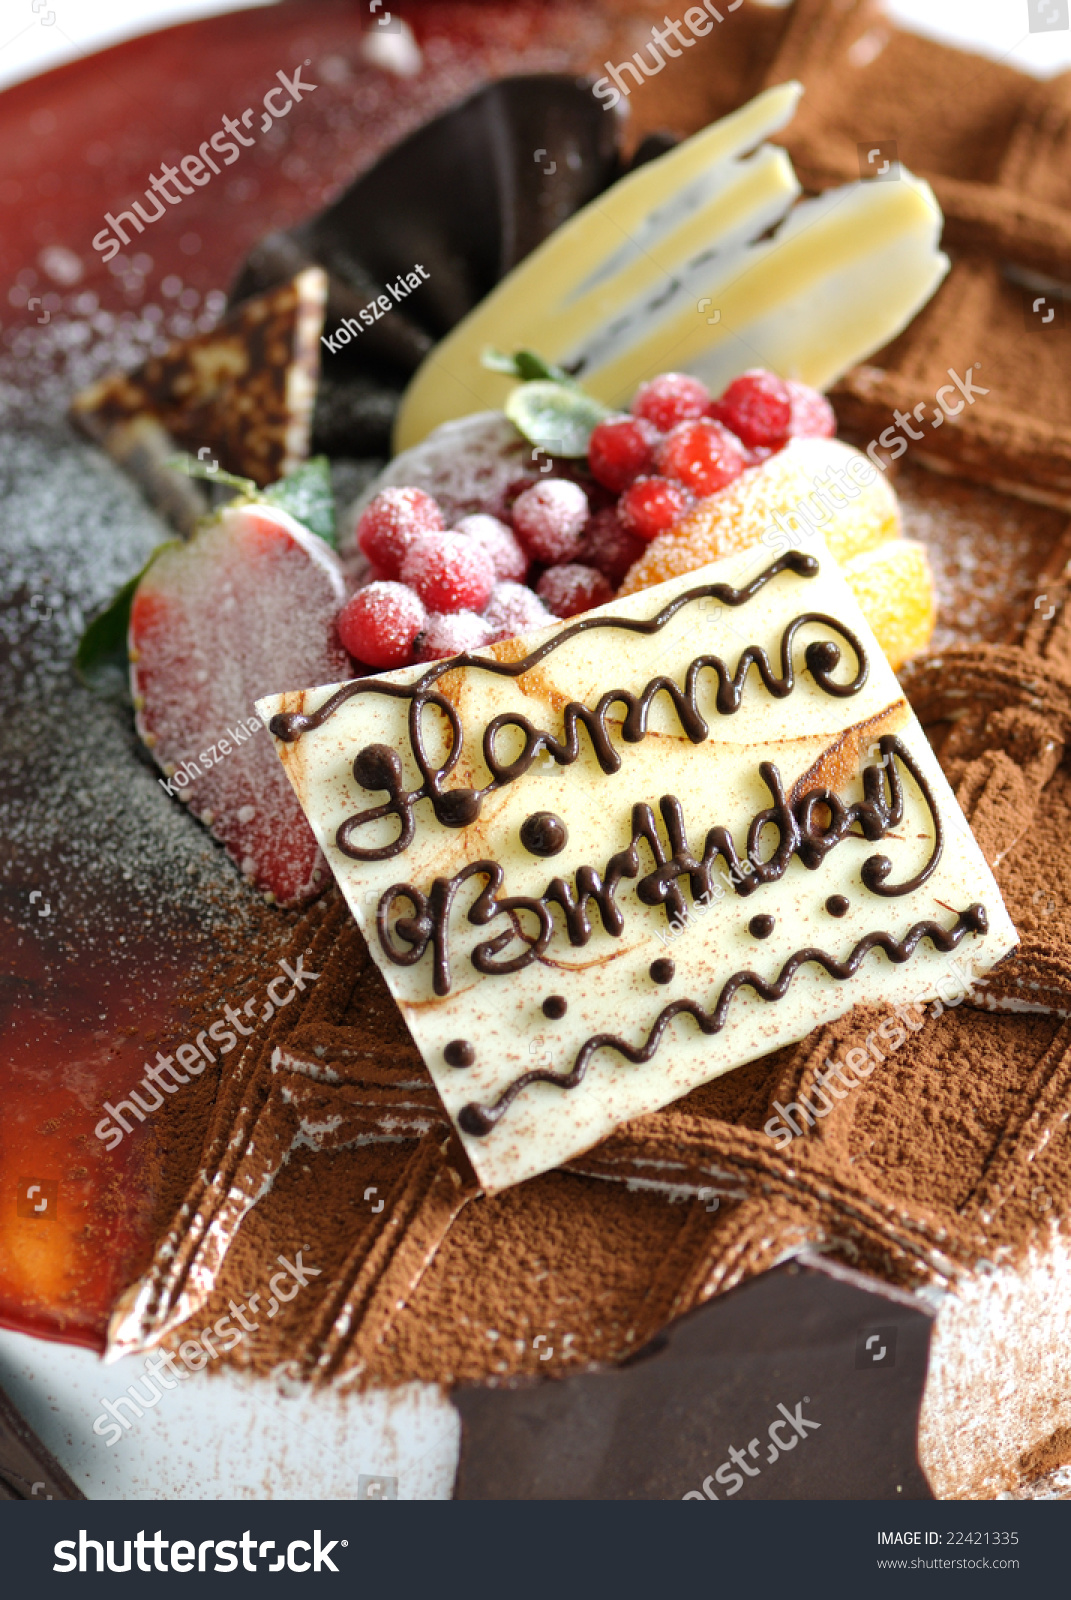 Birthday Cake Fruit Toppings Stock Photo Royalty Free 22421335